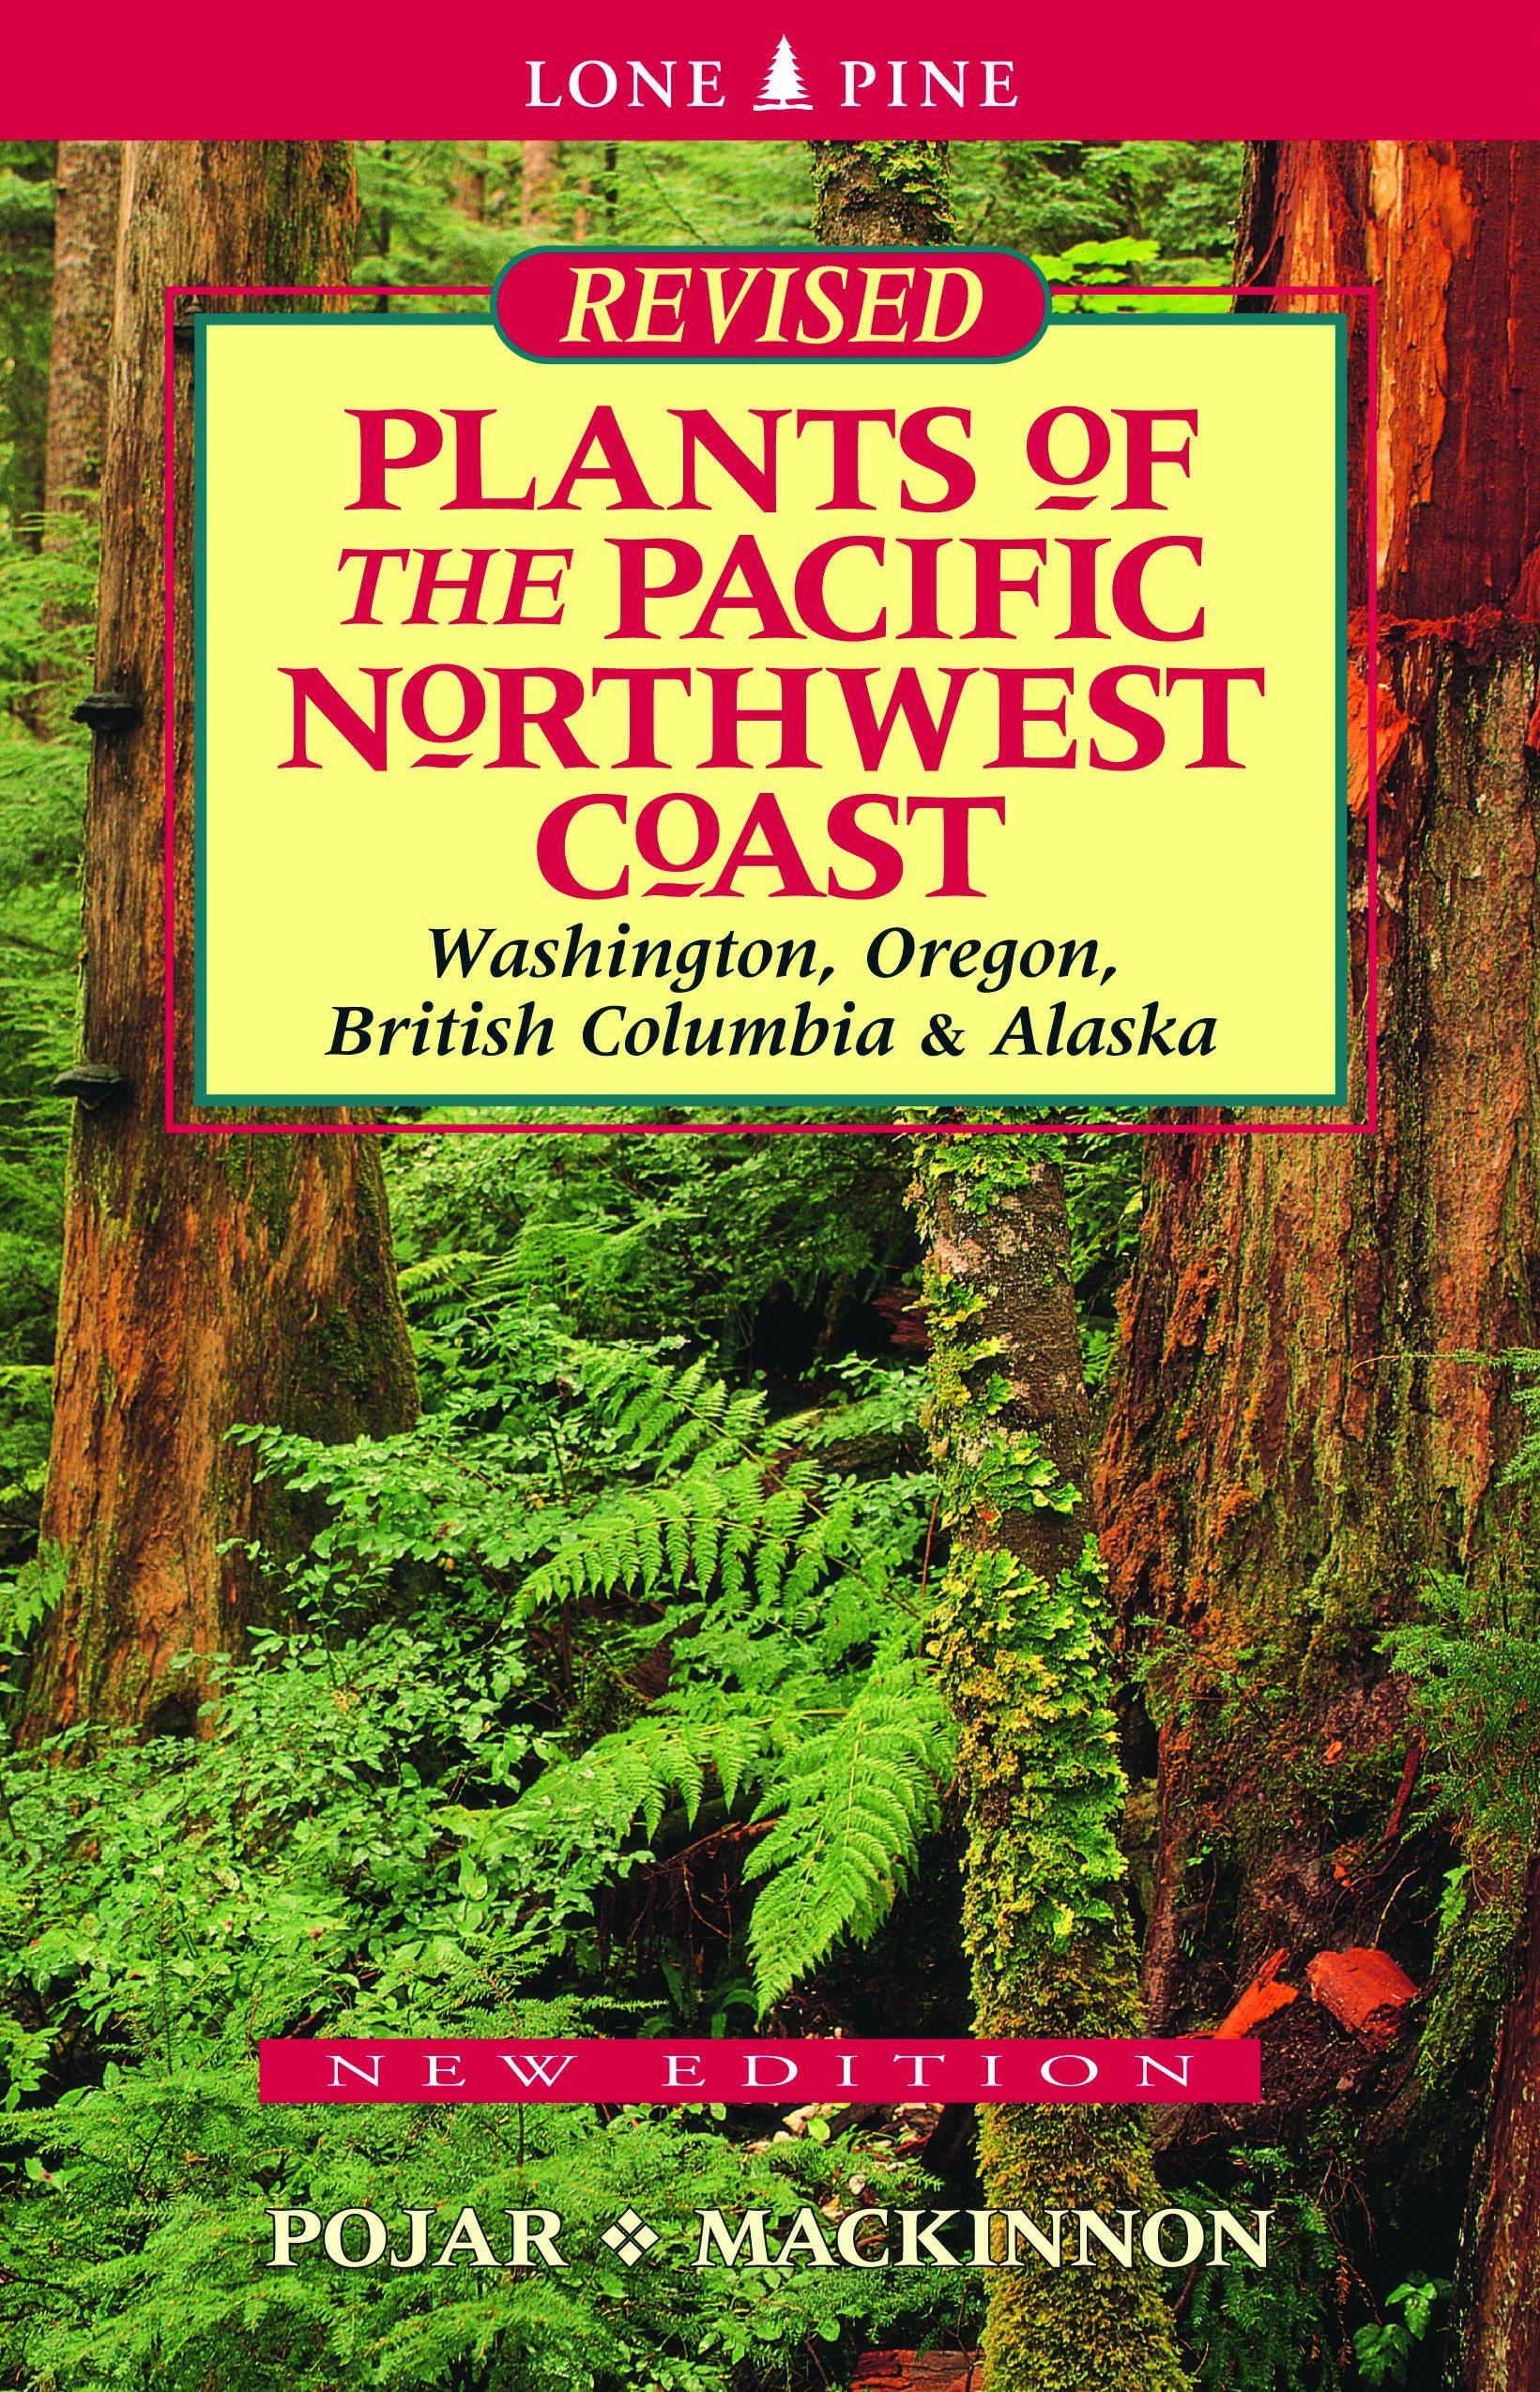 plants of the pacific northwest coast.jpg